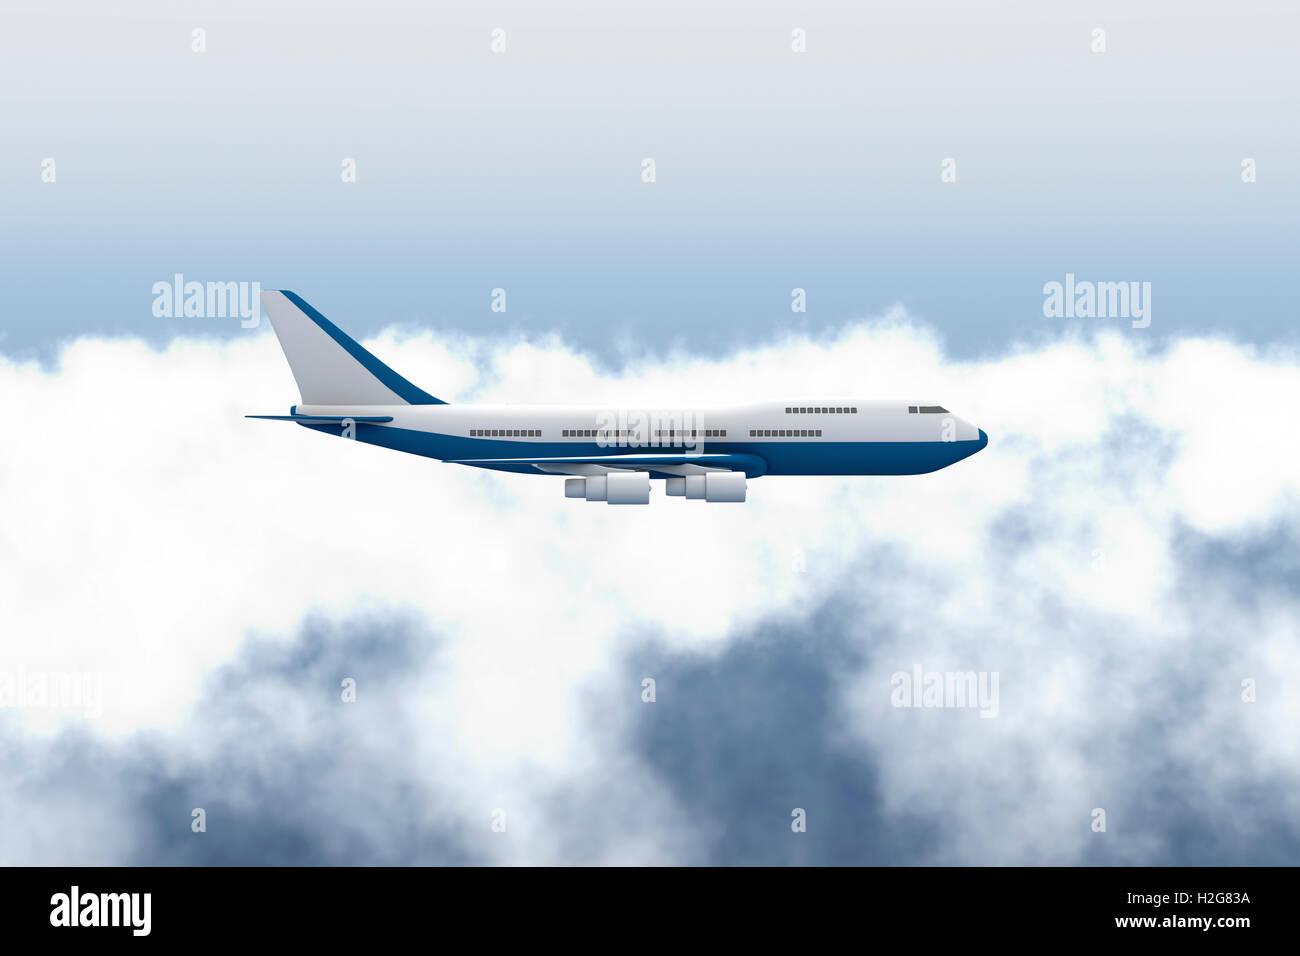 Aeroplane (Airplane) Flying - Stock Image